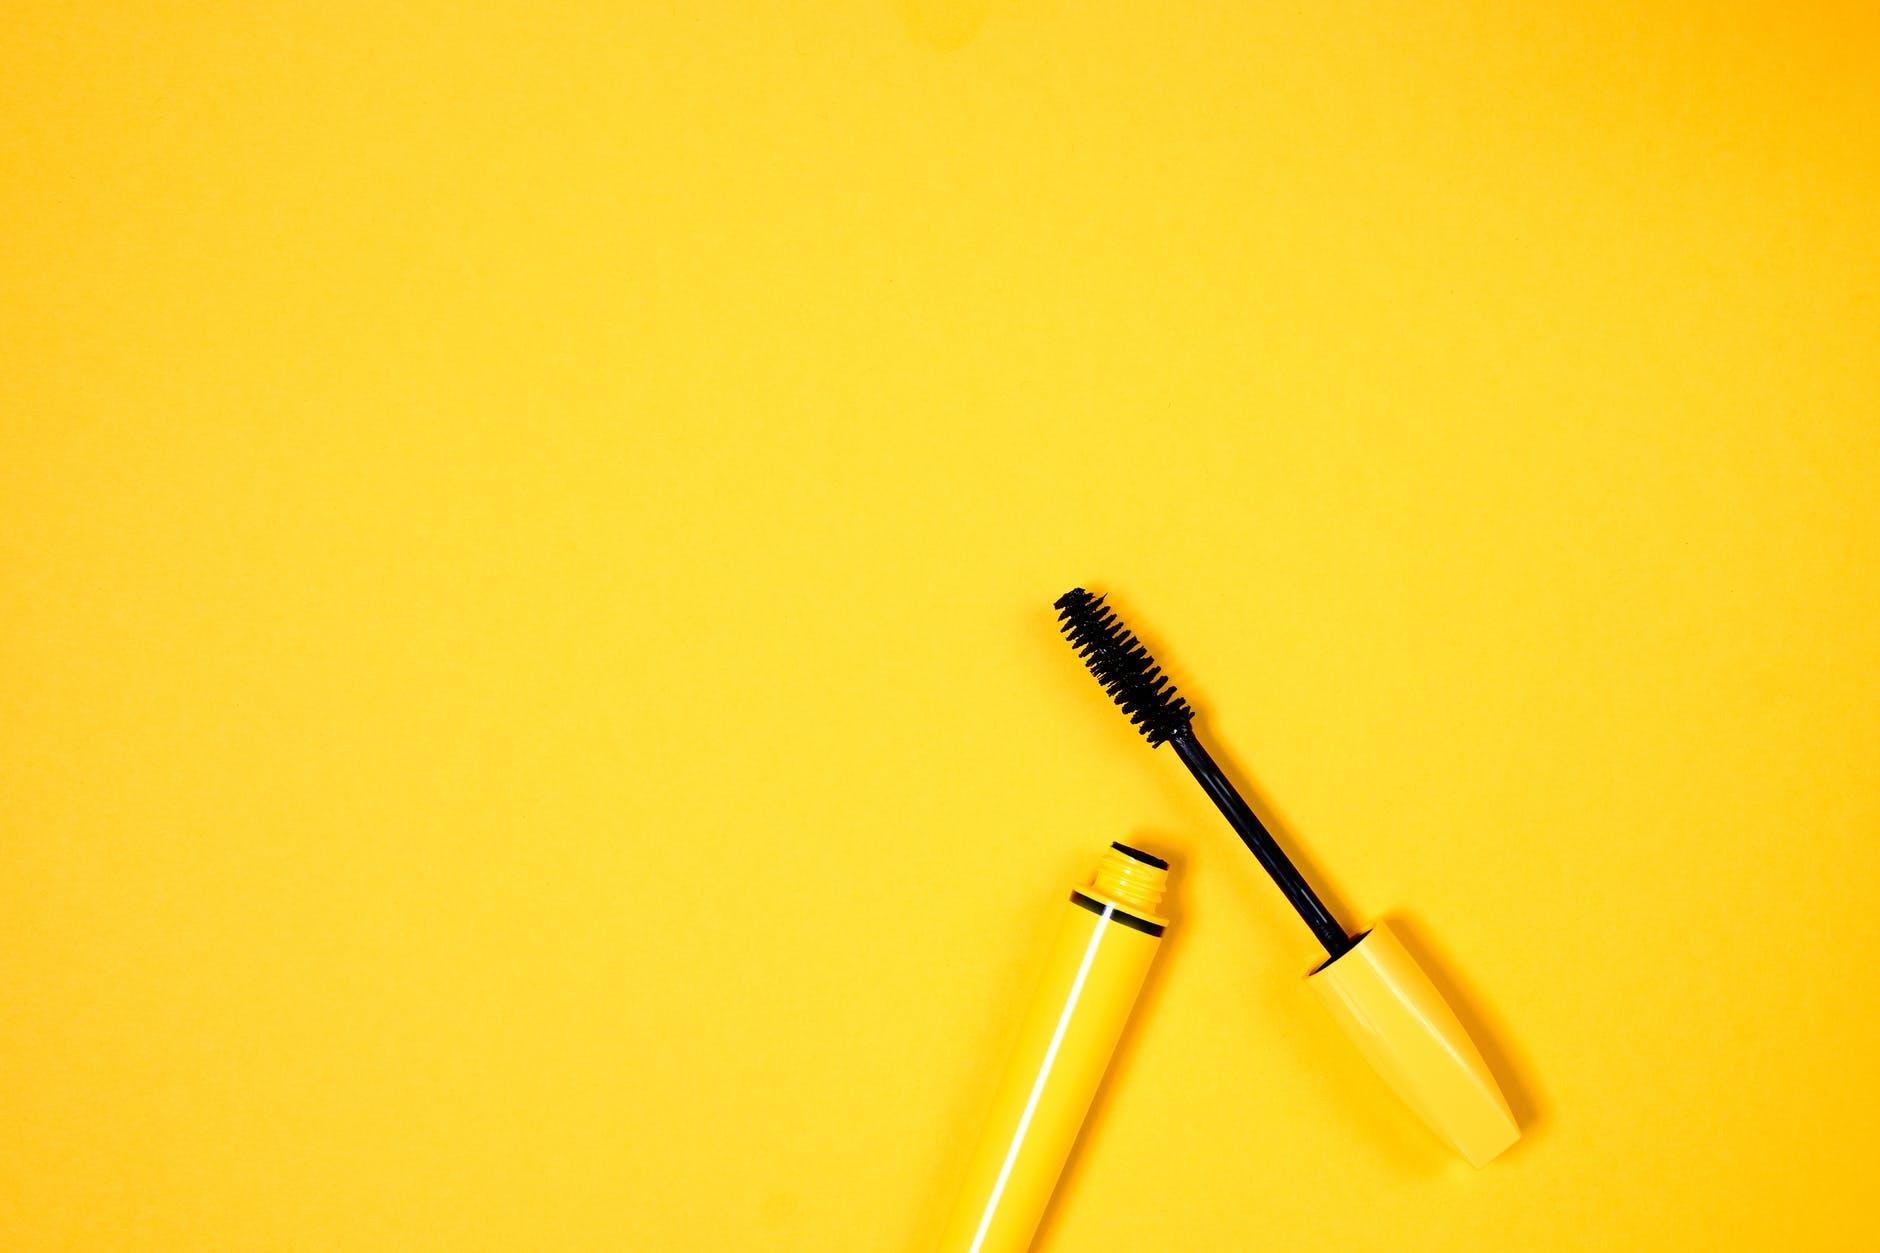 yellow mascara on yellow background